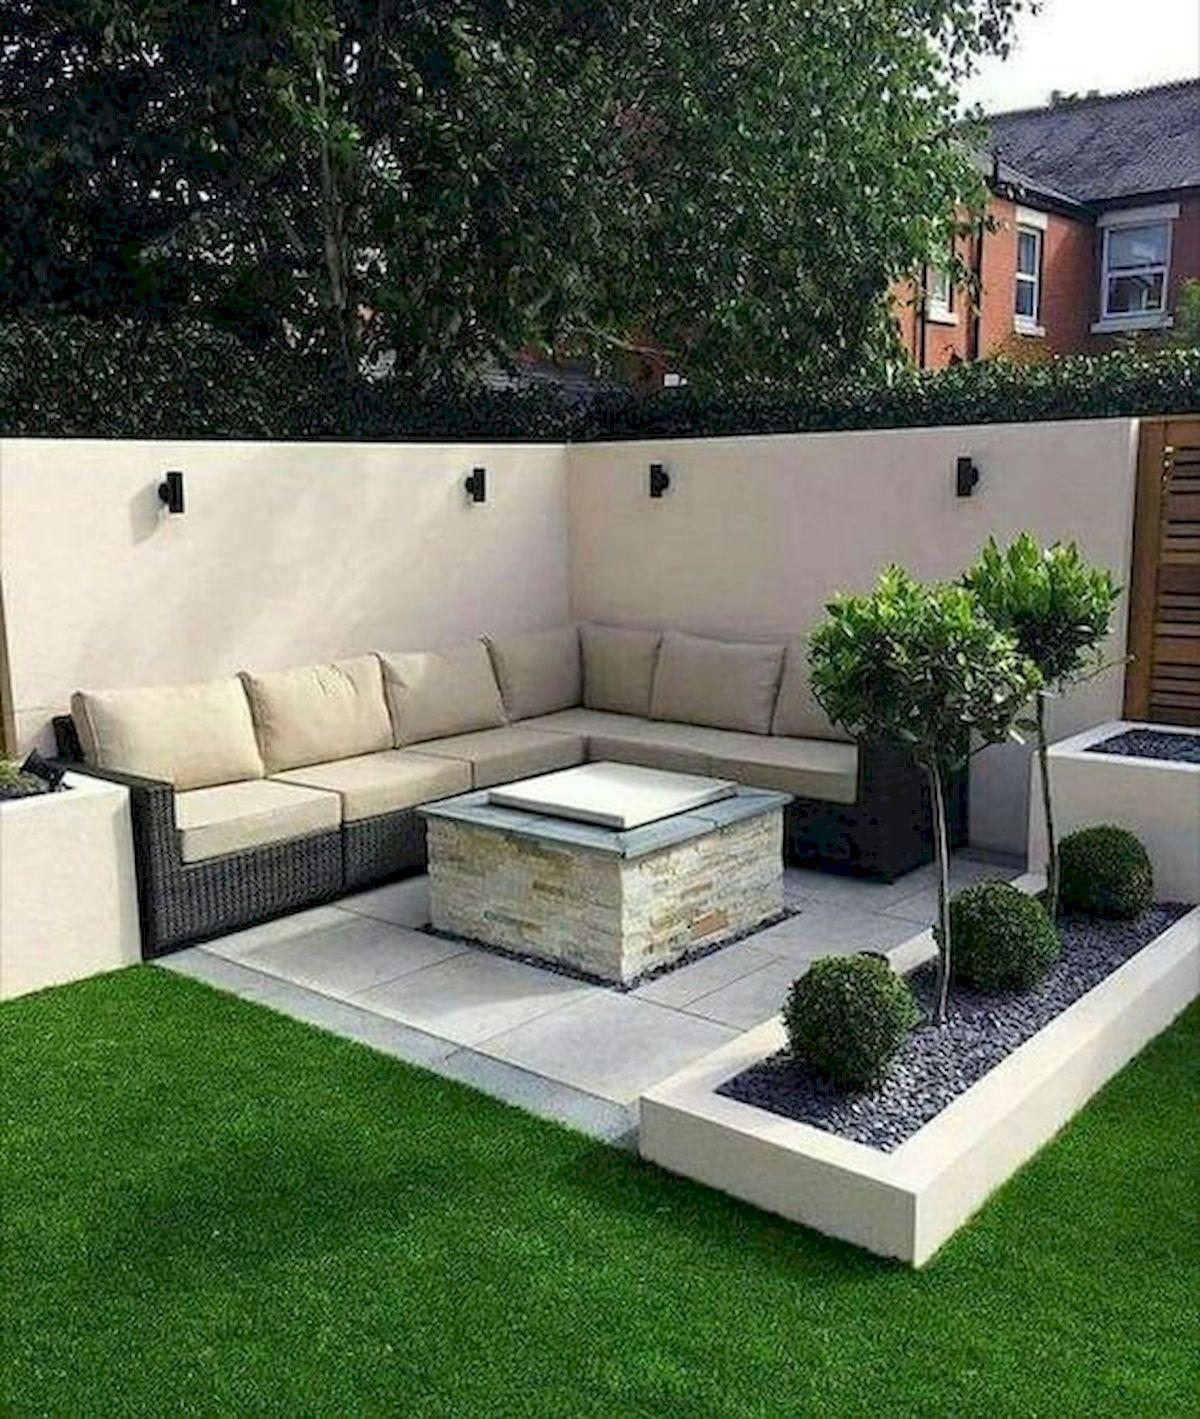 33 Beautiful Backyard Garden Design Ideas33DECOR | Garden ... on Back Garden Seating Area Ideas id=42335